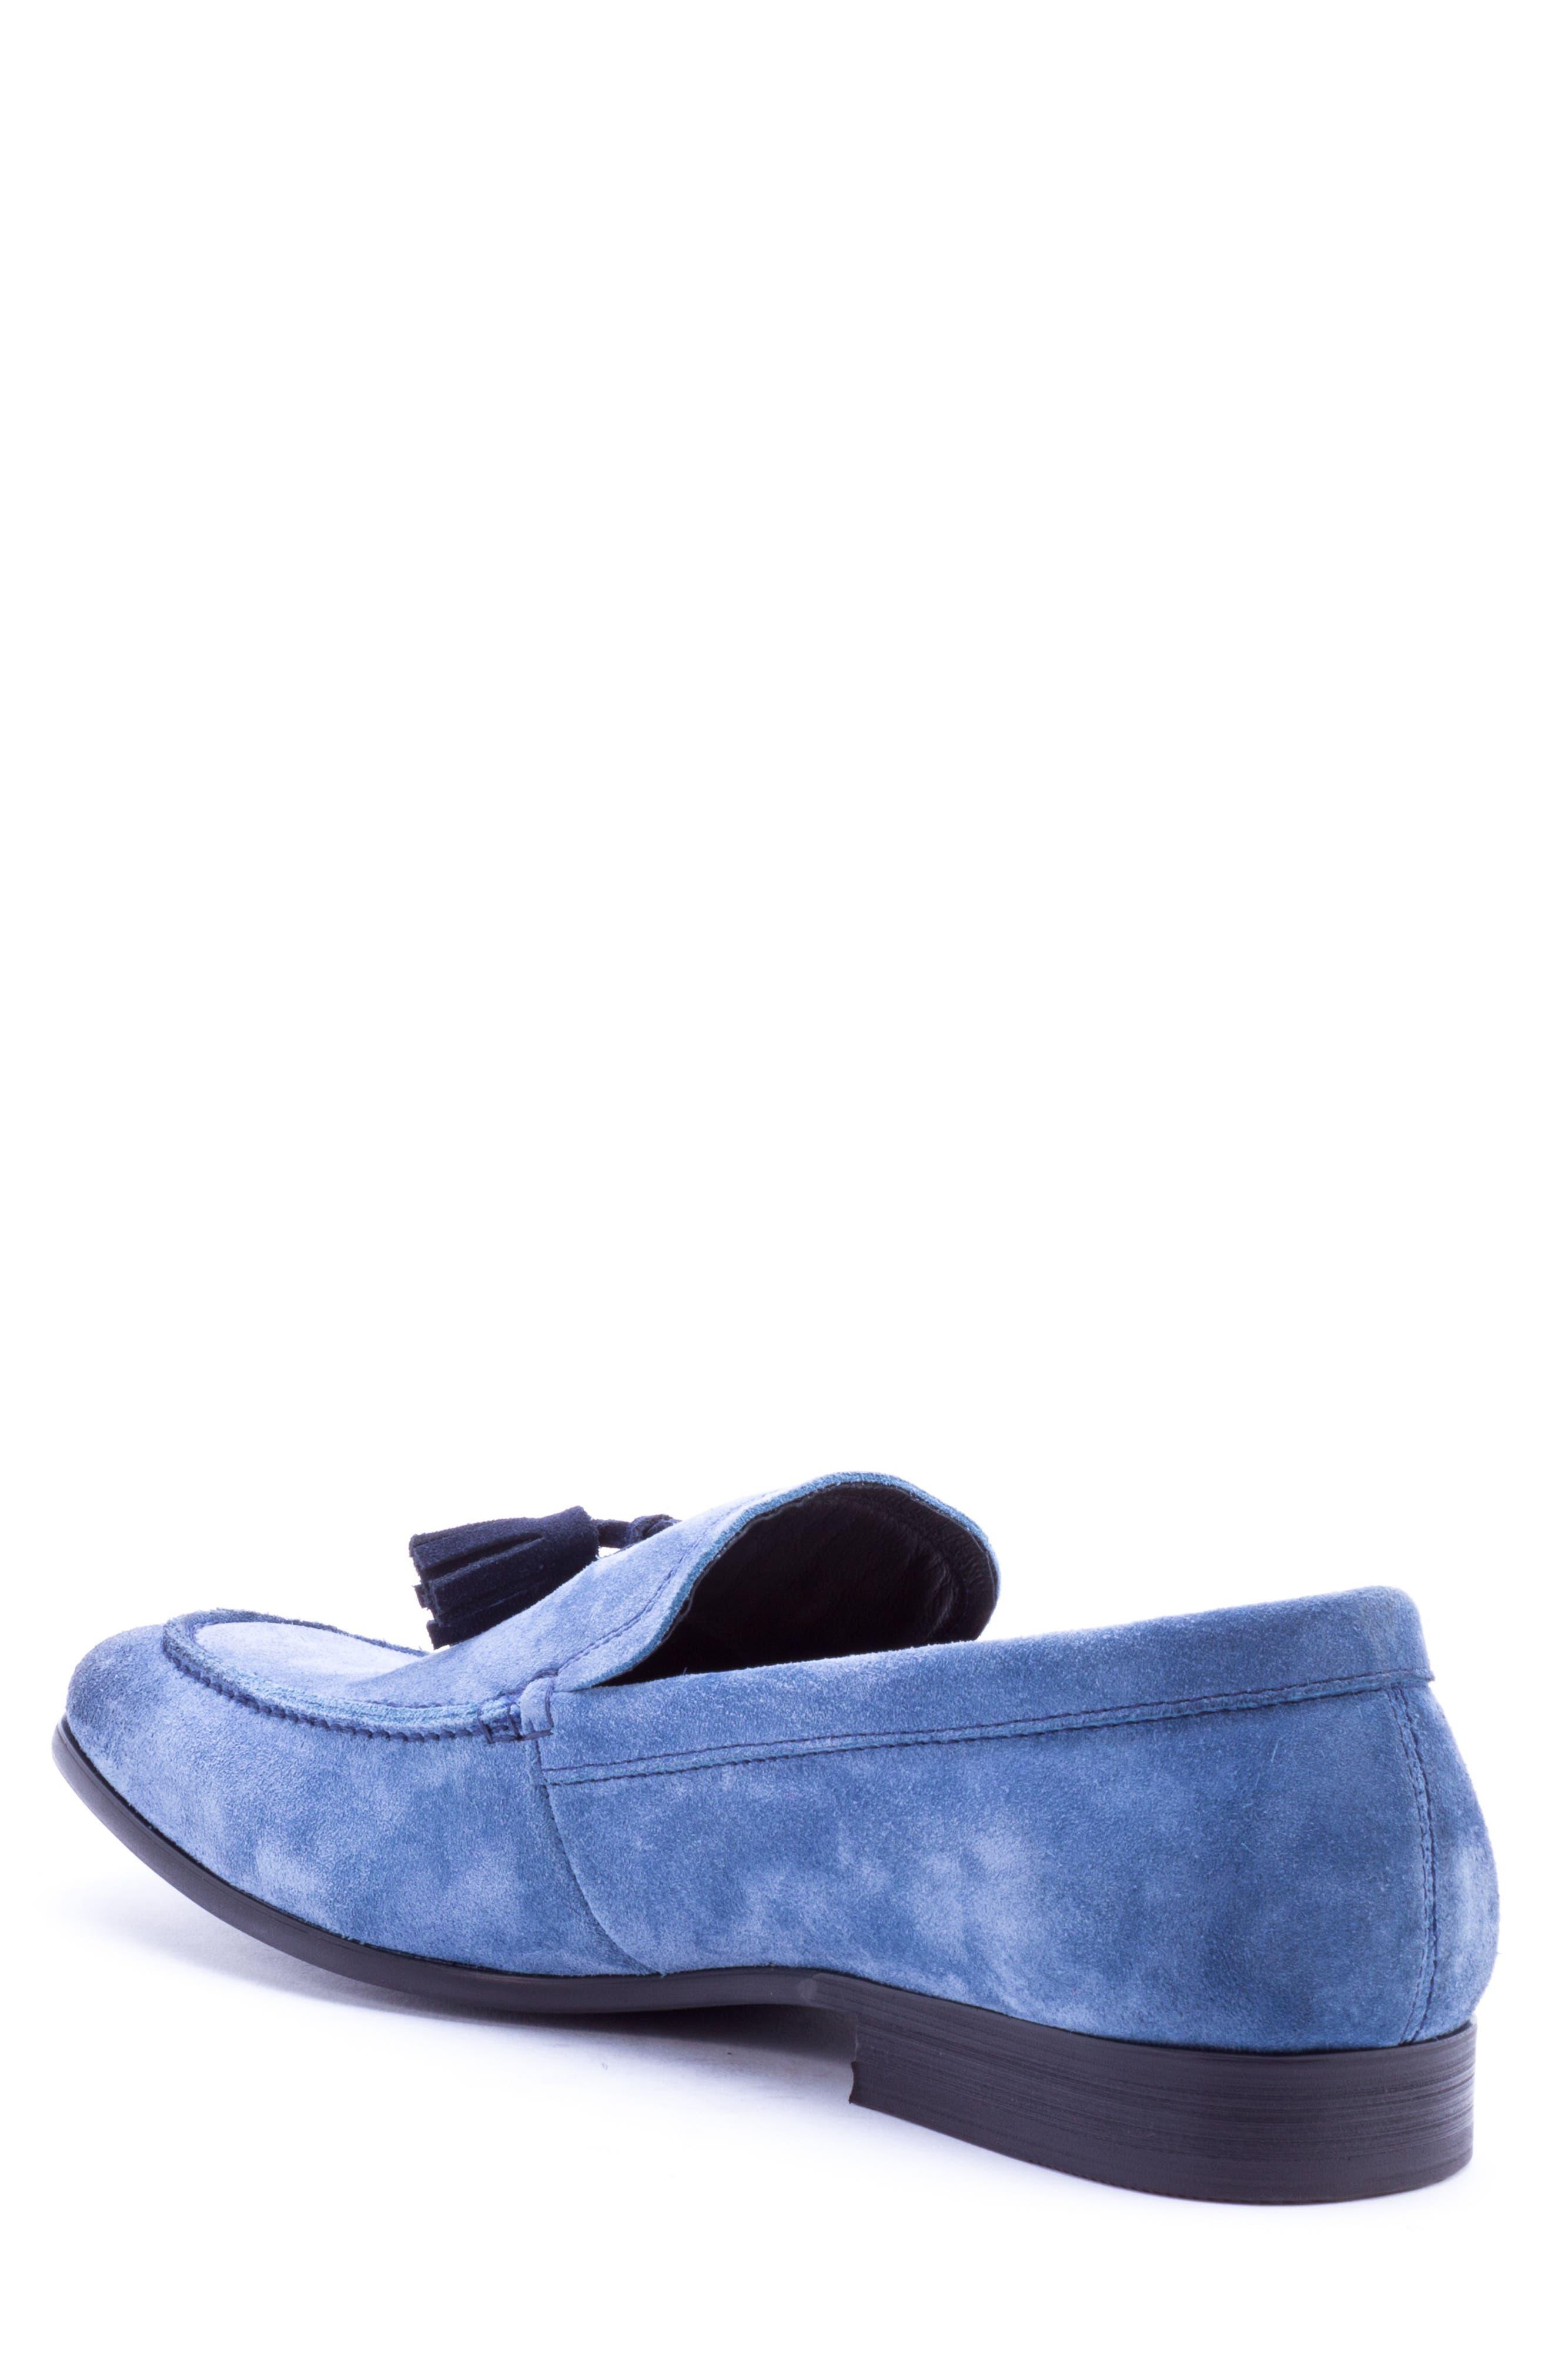 Severn Tassel Venetian Loafer,                             Alternate thumbnail 2, color,                             Blue Suede